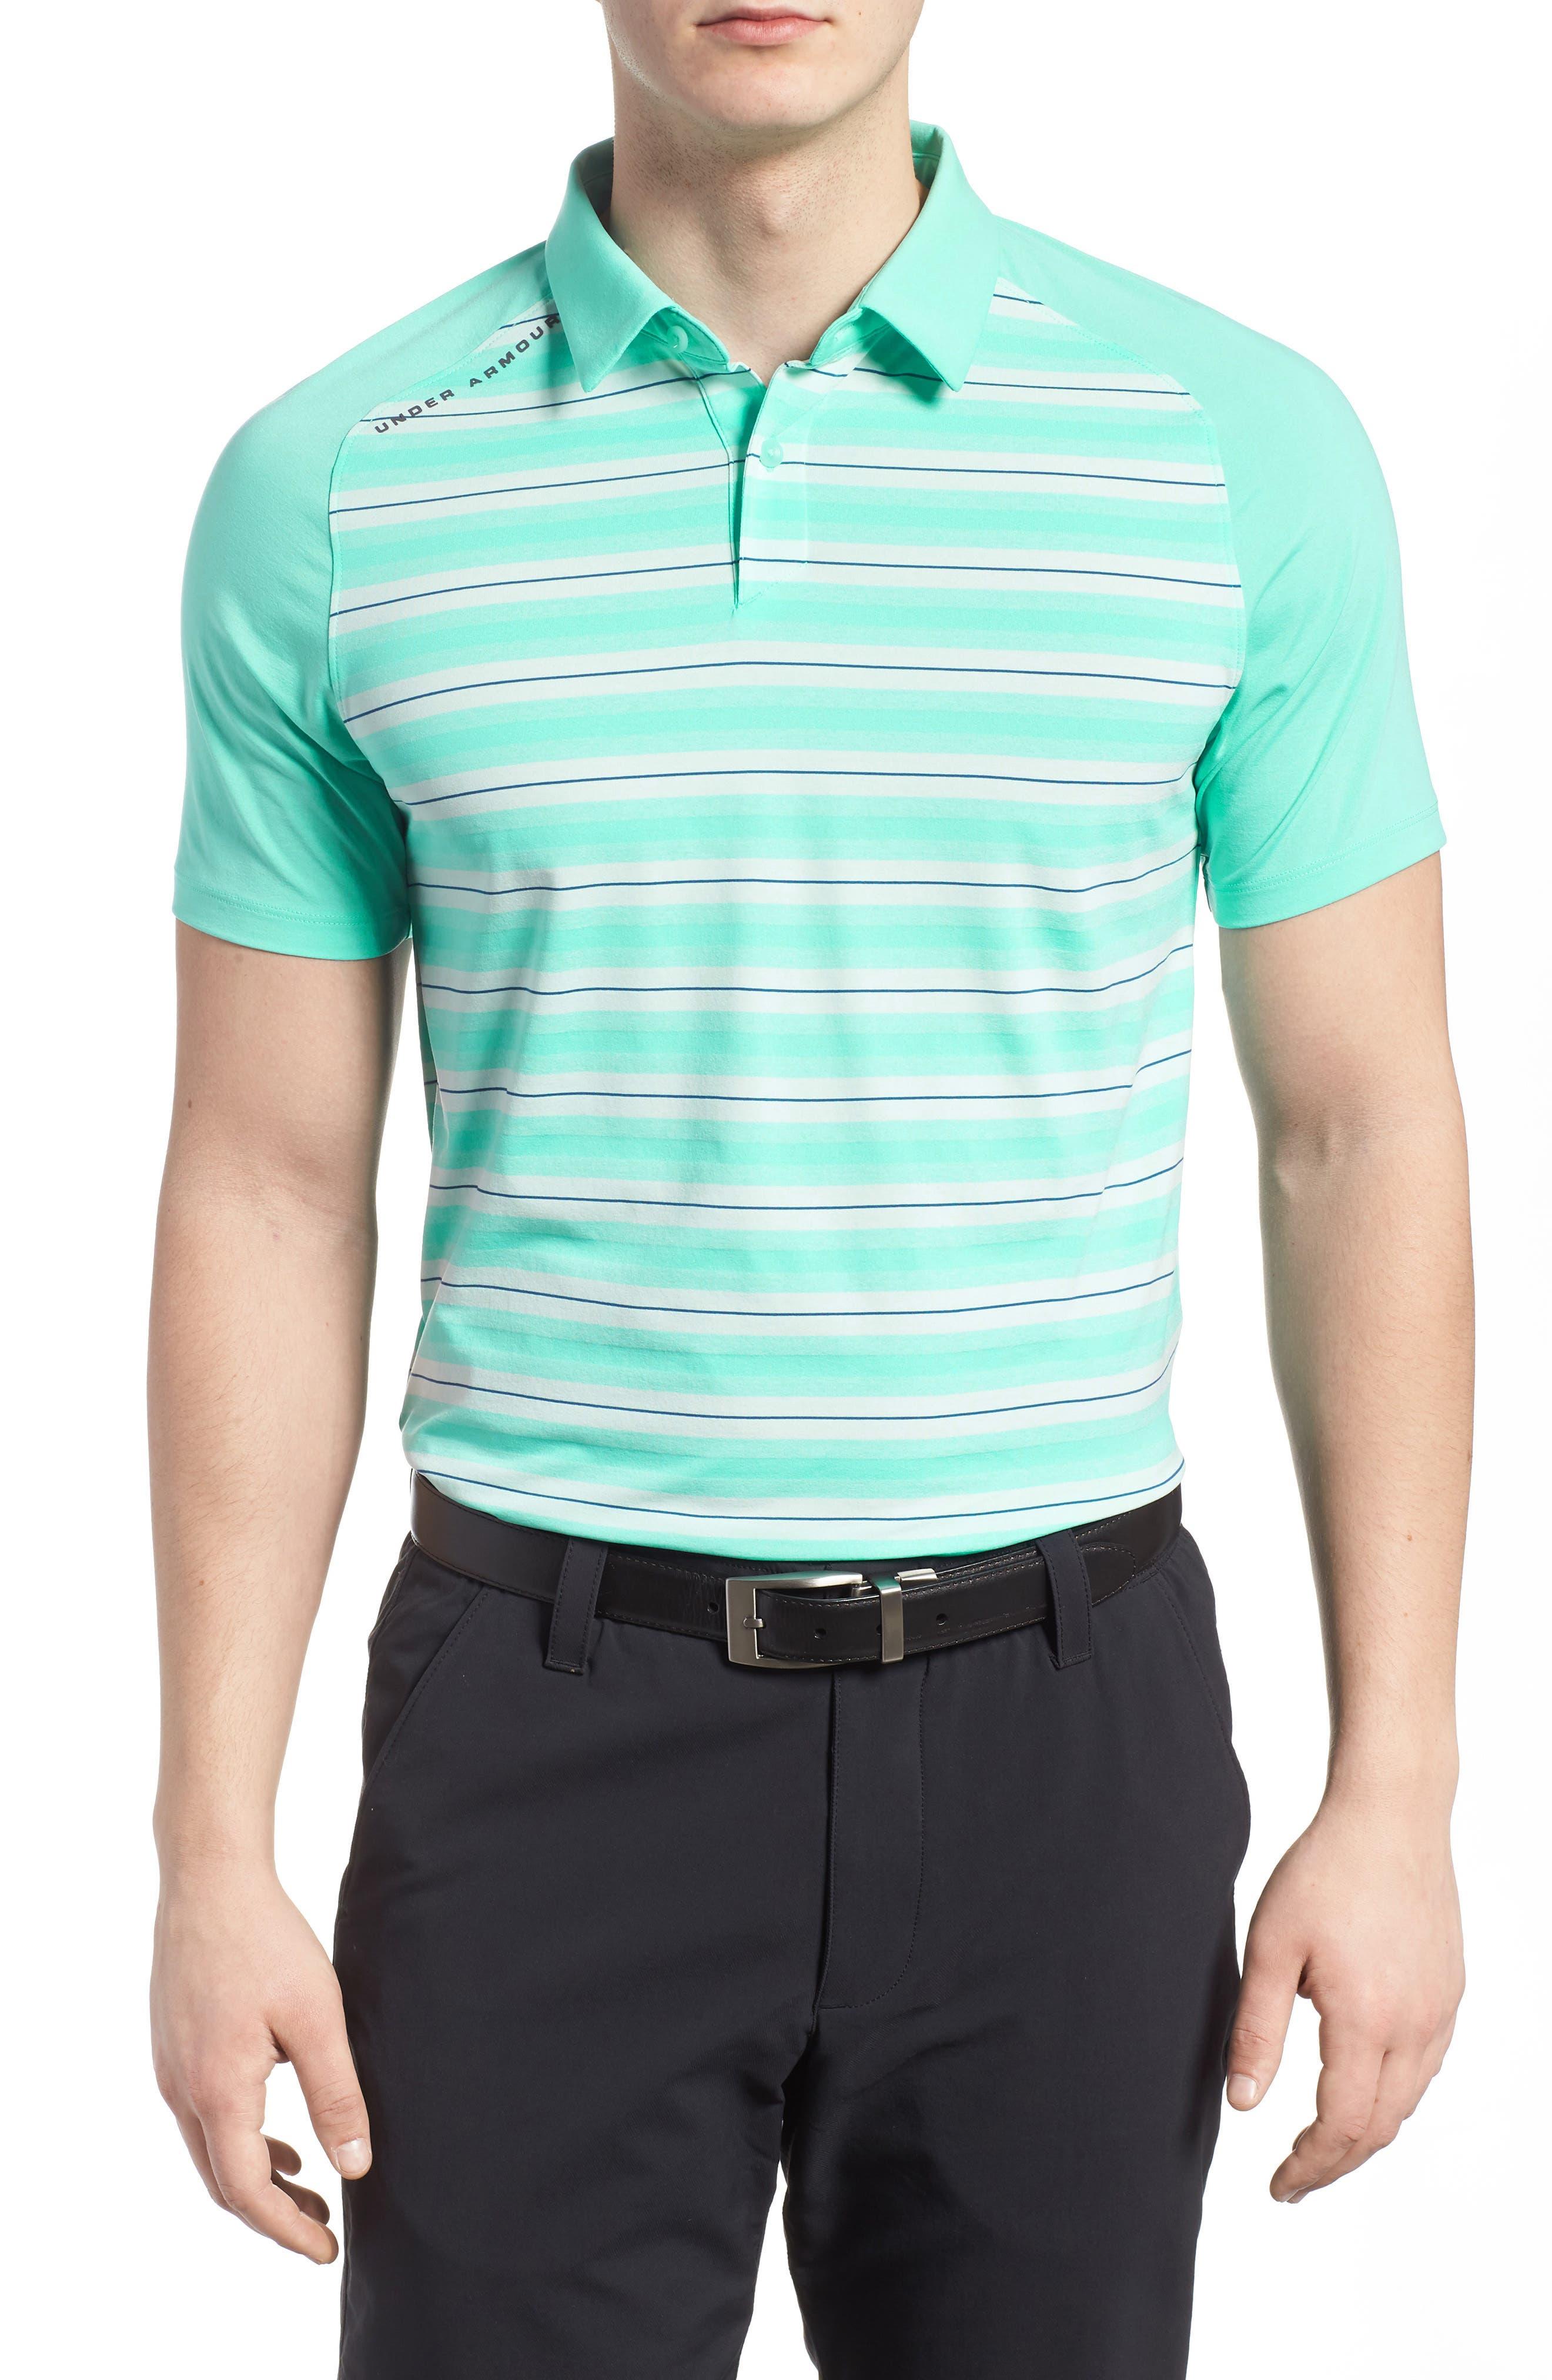 Alternate Image 1 Selected - Under Armour Threadborne Boundless Regular Fit Polo Shirt